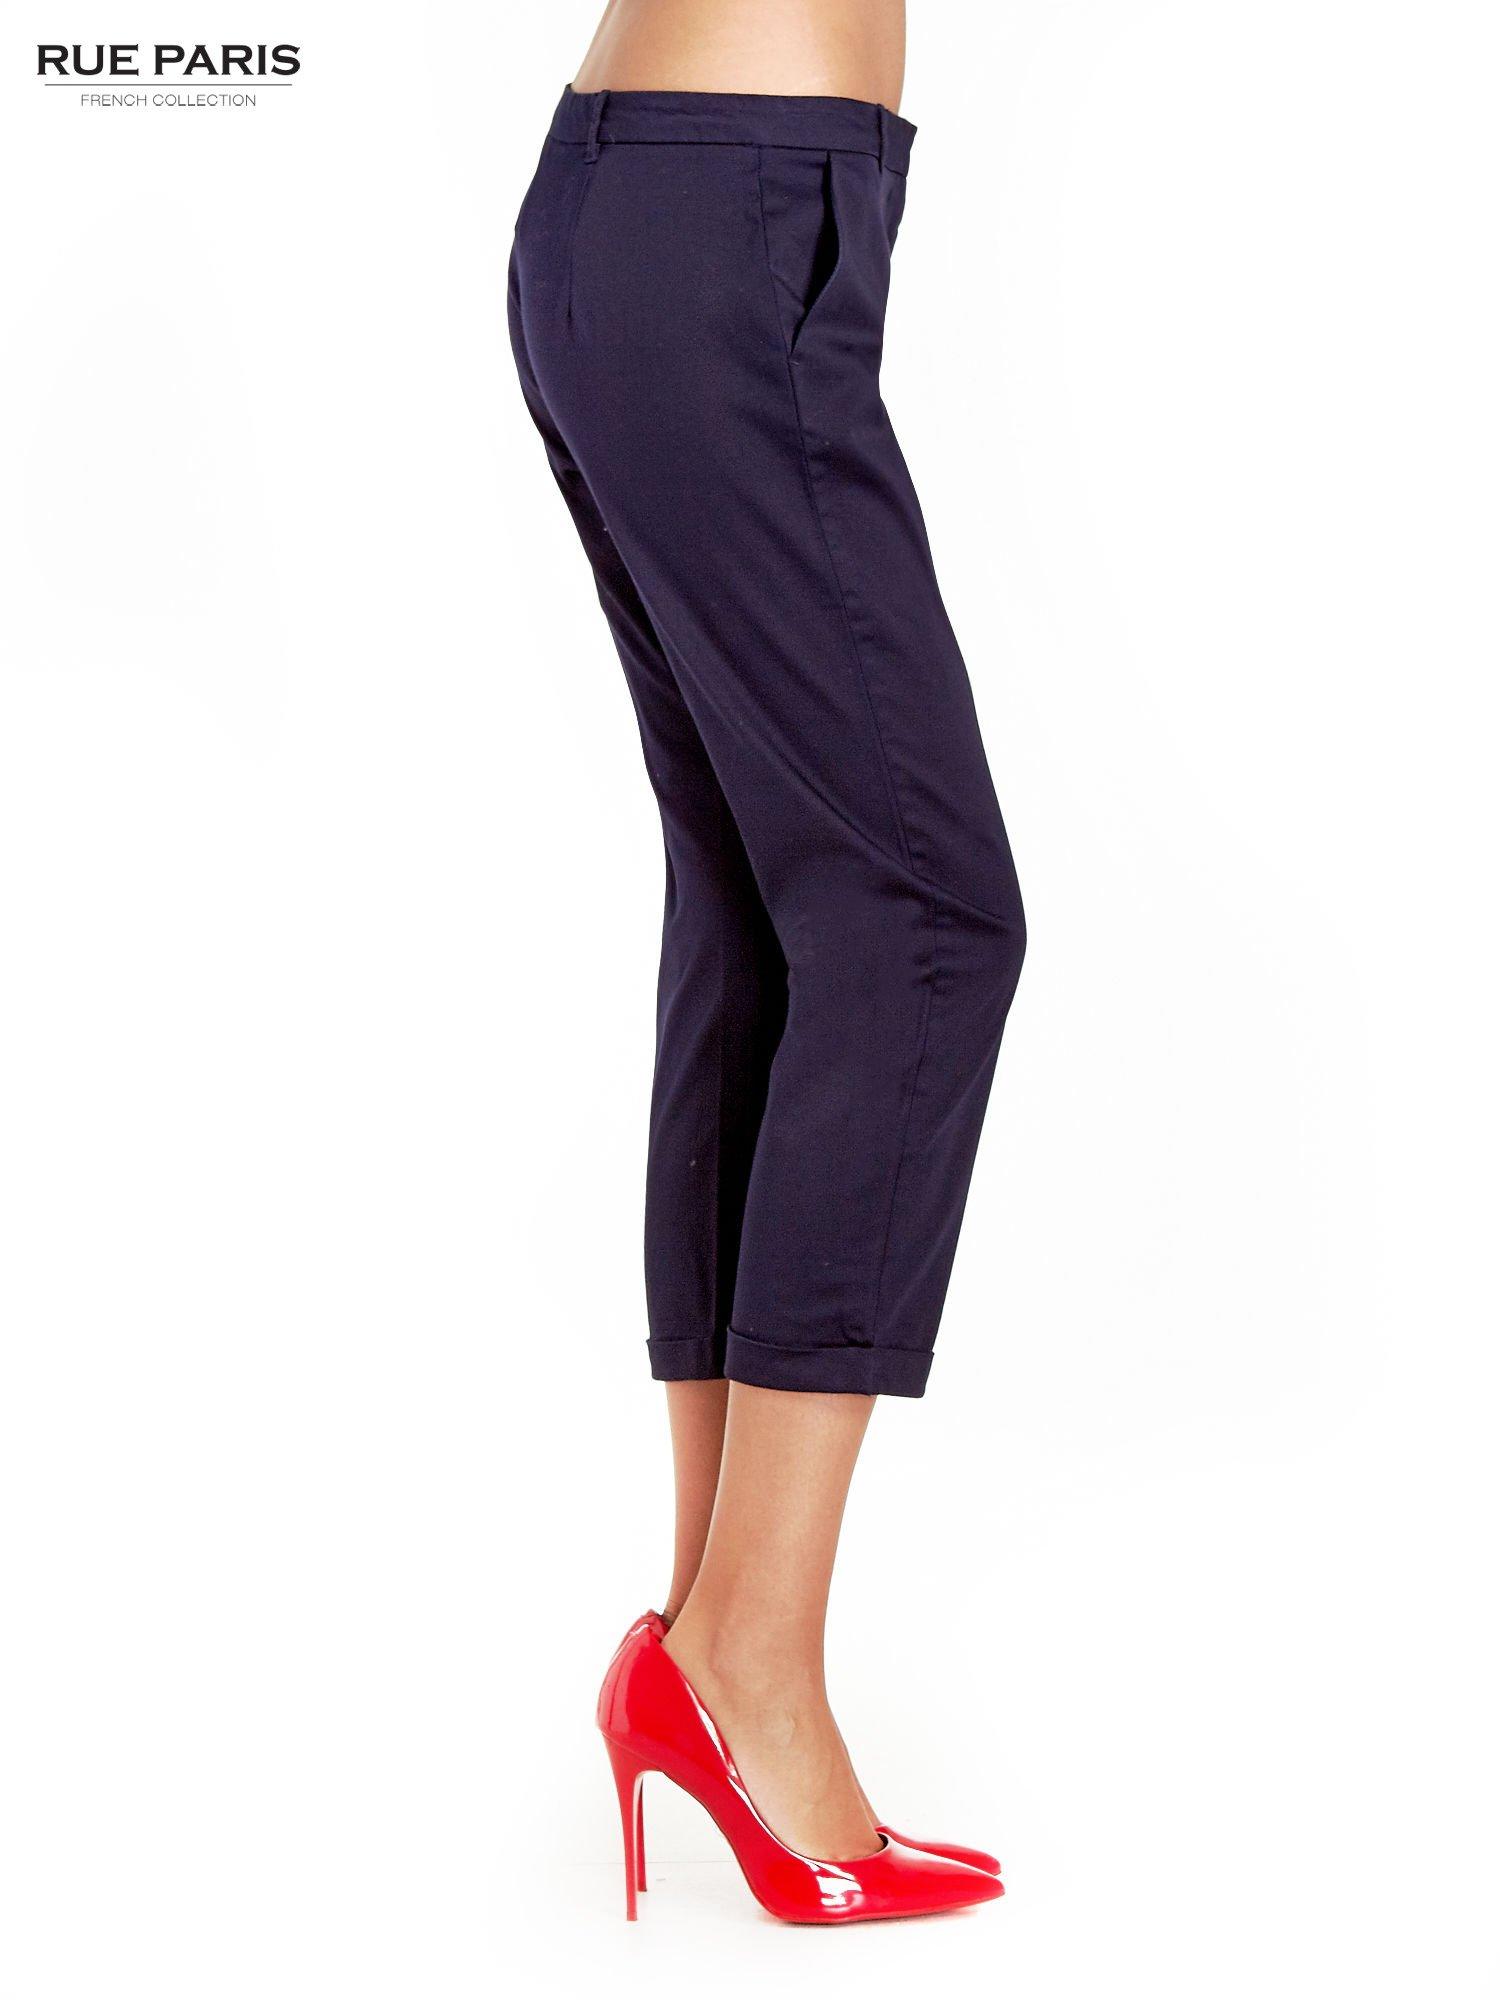 Granatowe eleganckie spodnie za kolano                                  zdj.                                  3